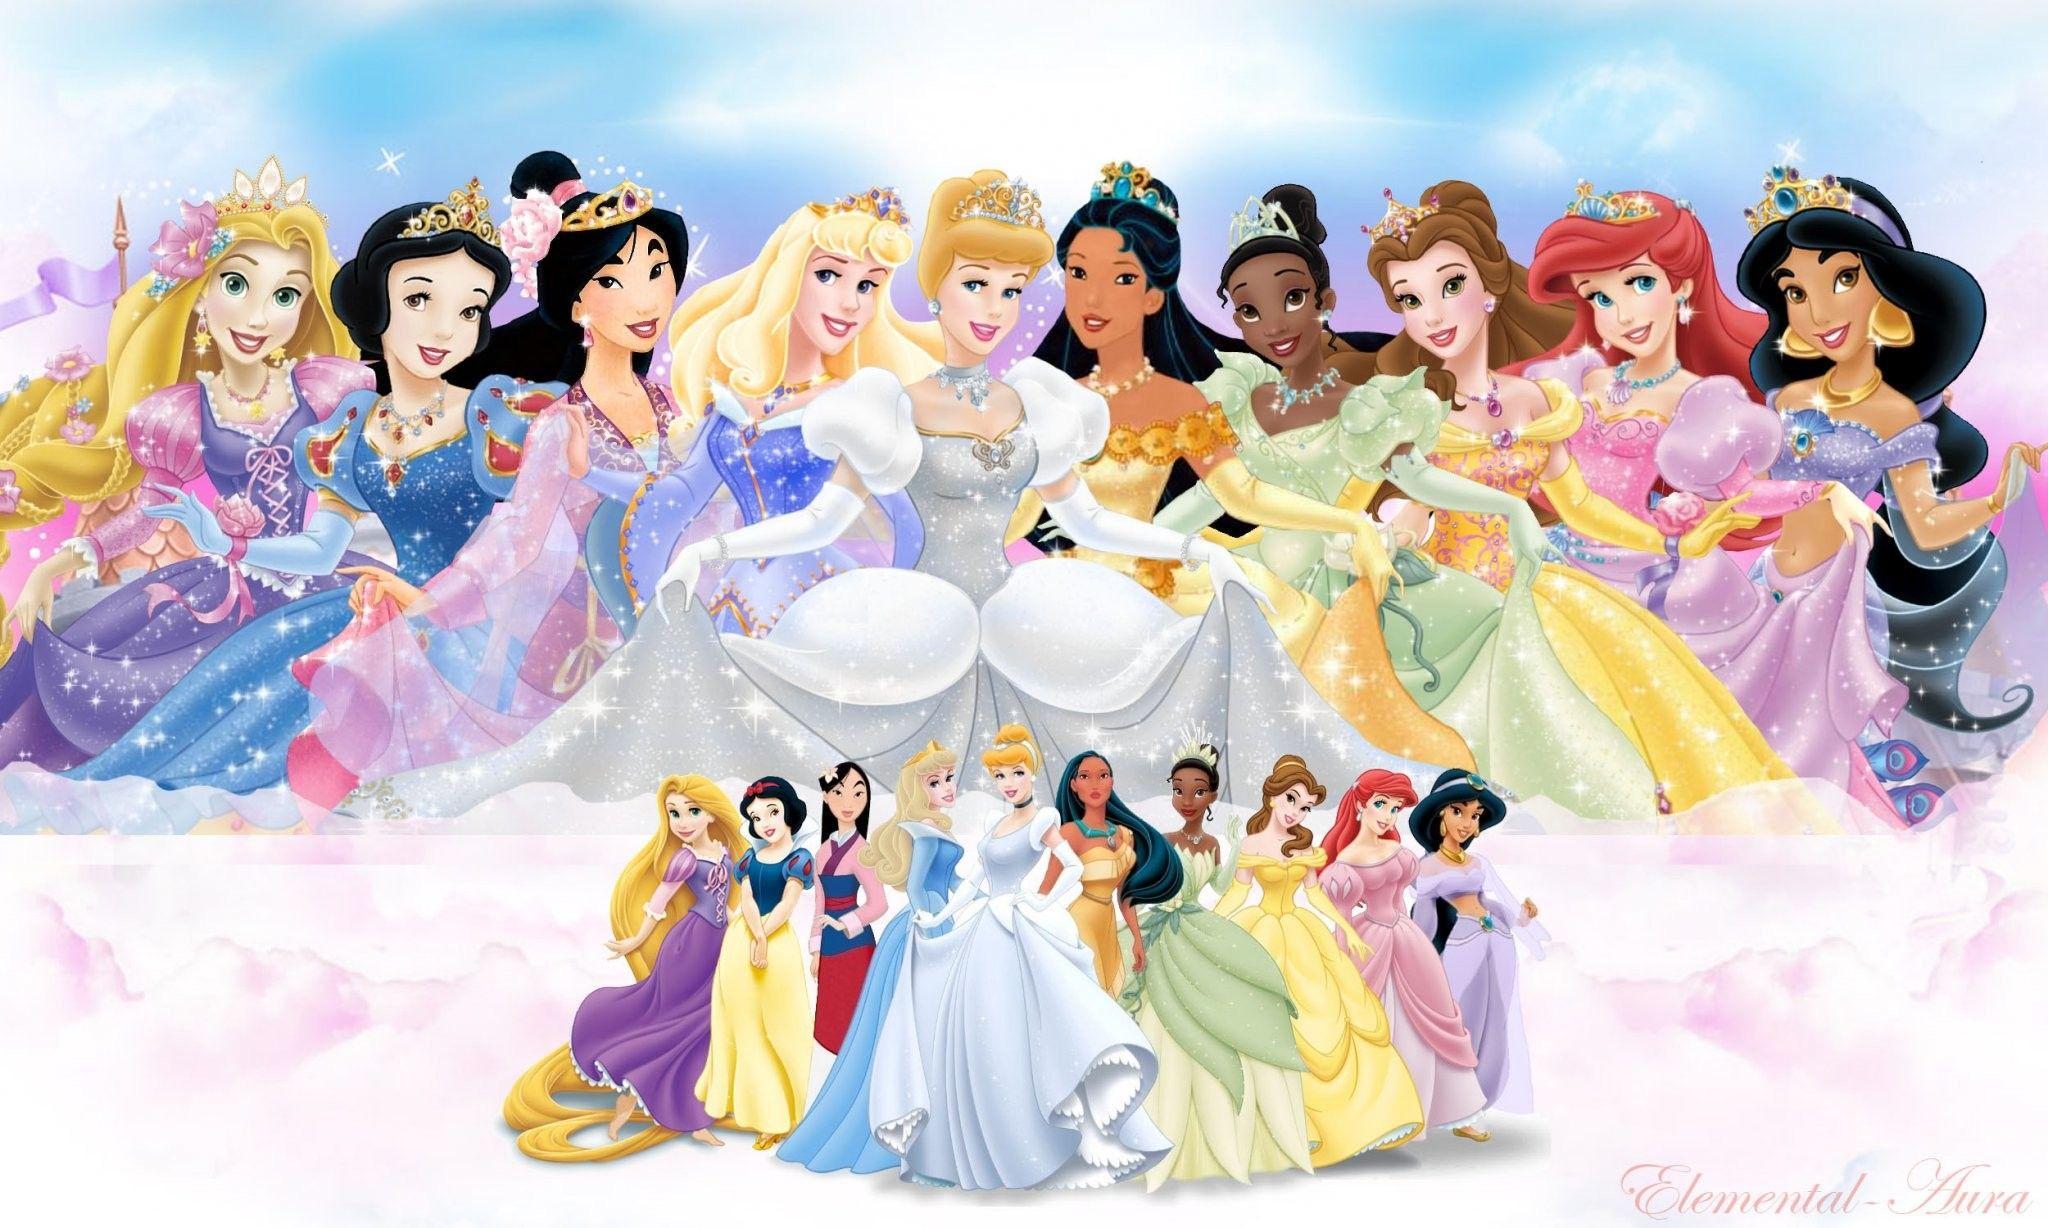 Disney Princess Ipad Wallpapers Top Free Disney Princess Ipad Backgrounds Wallpaperaccess